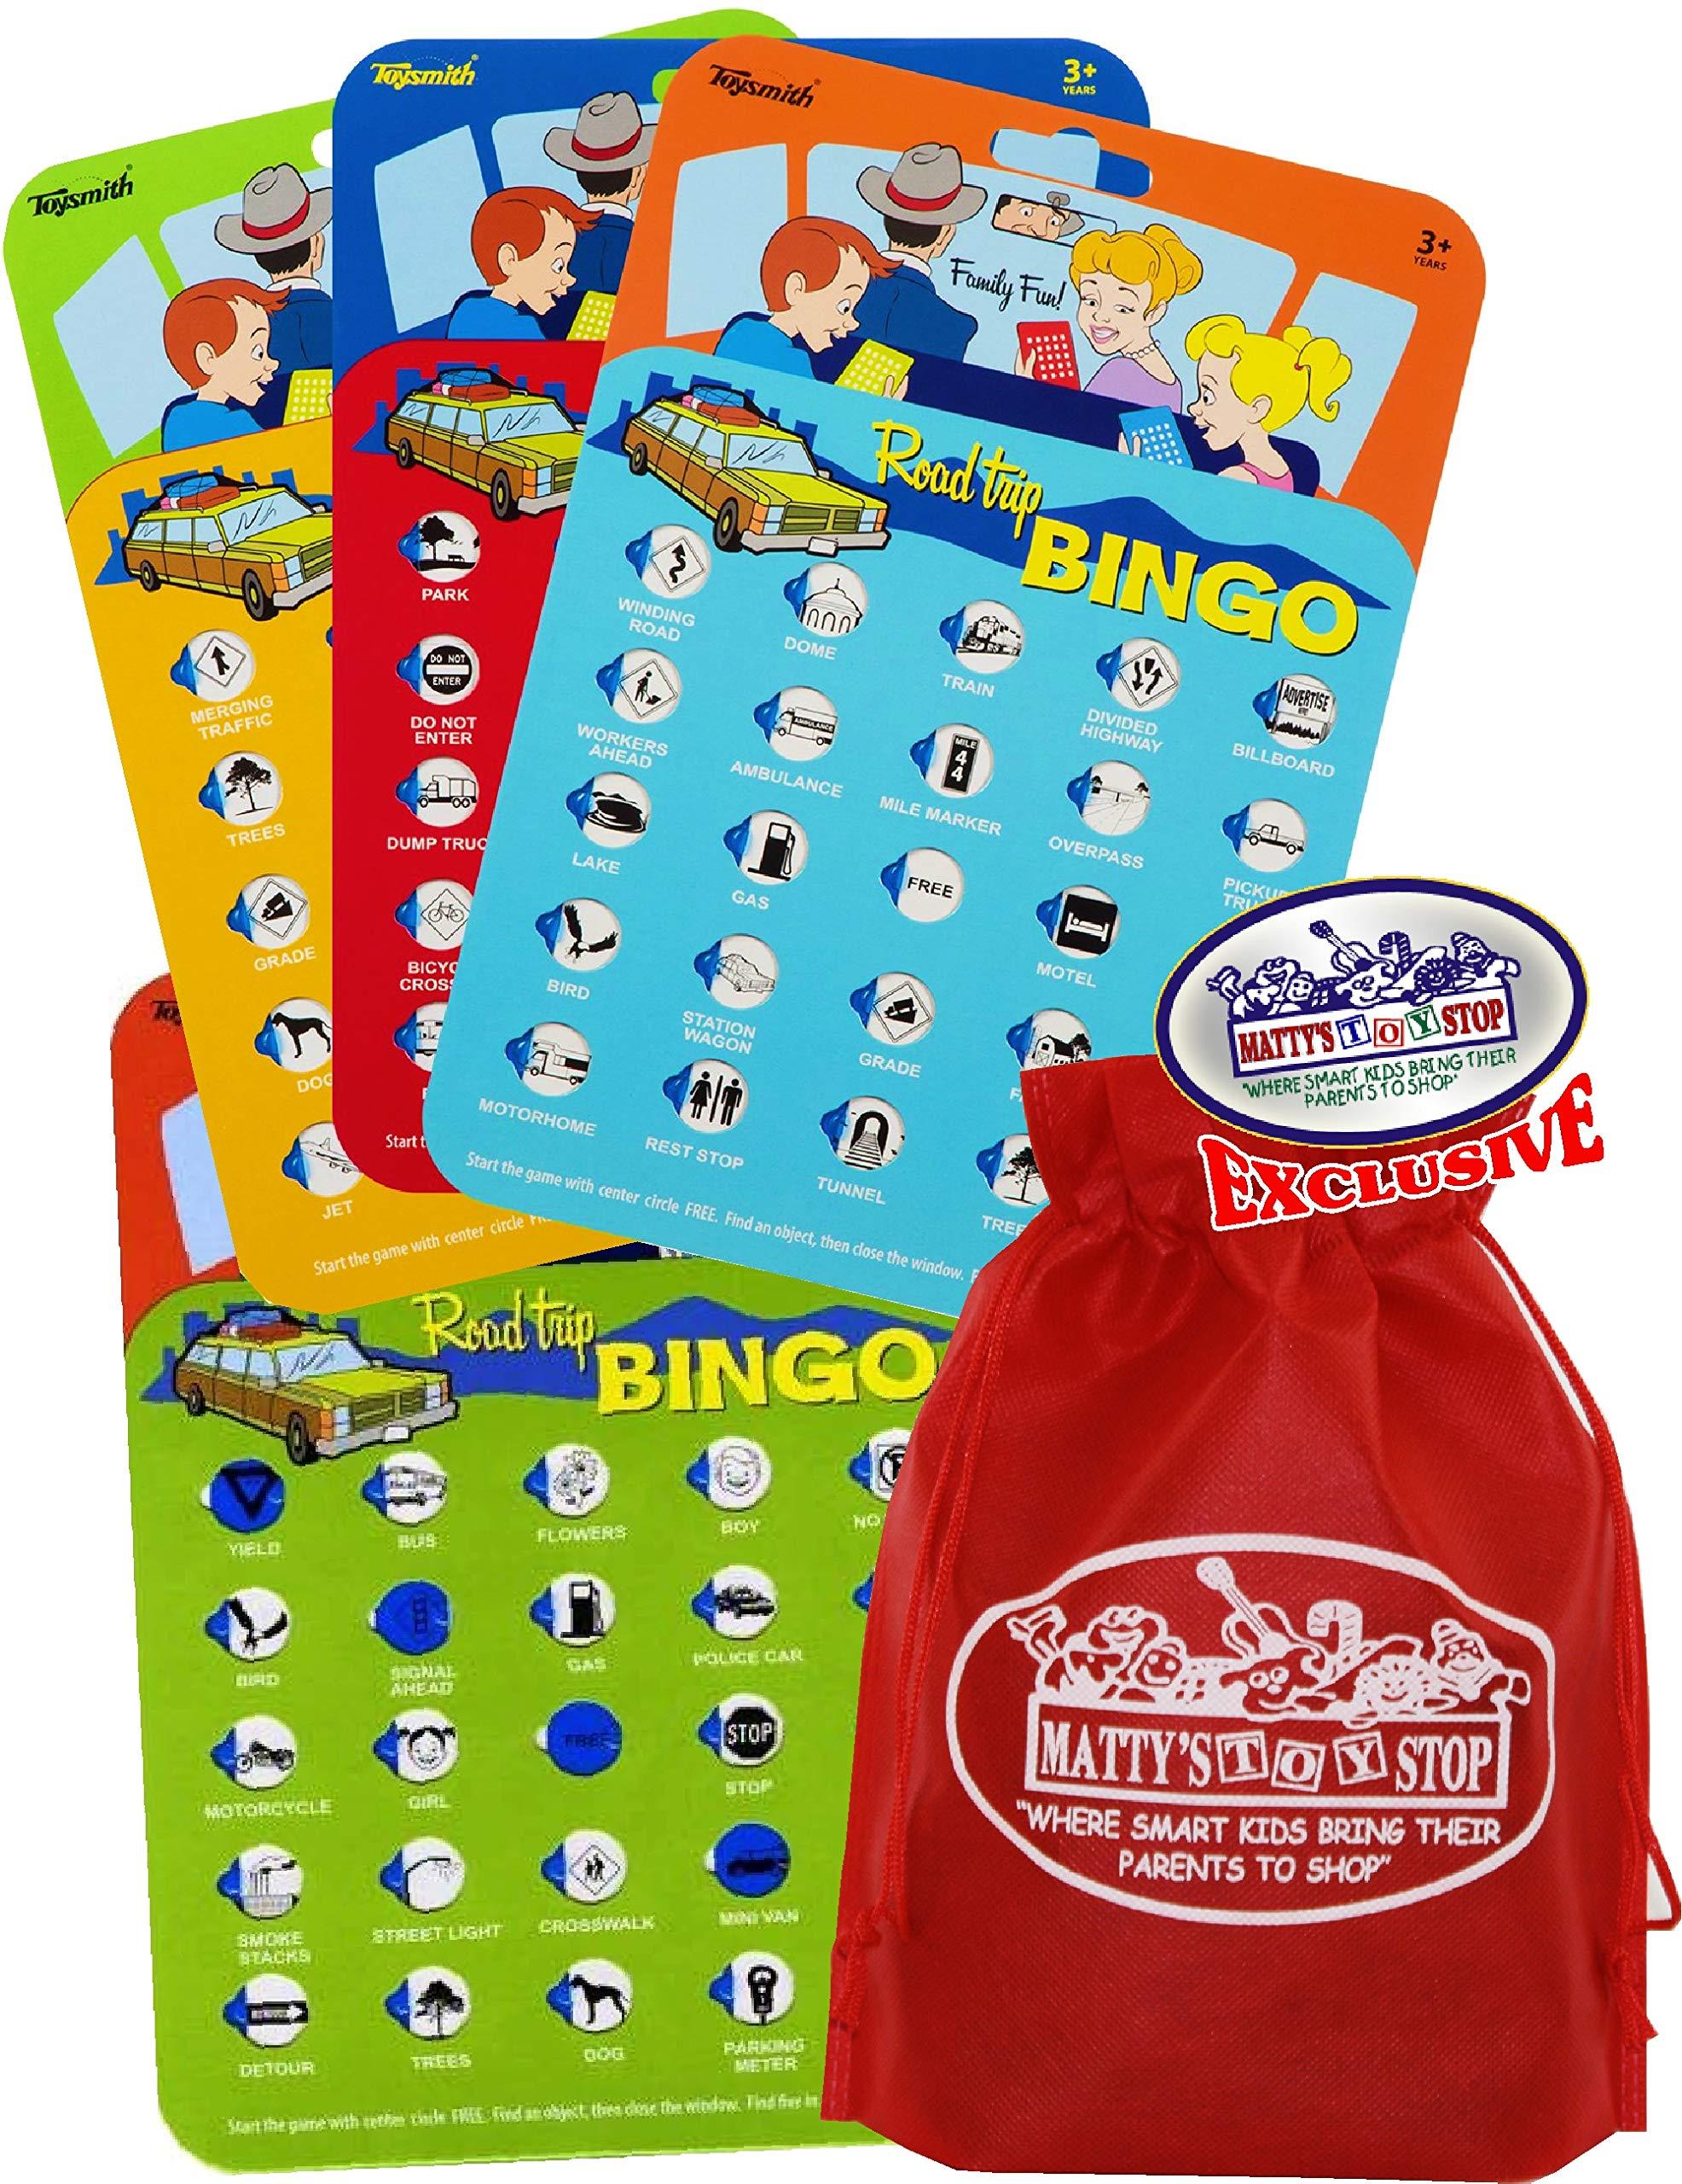 Toysmith Road Trip Bingo Cards Red, Blue, Green & Orange Gift Set Travel Bundle with Bonus Matty's Toy Stop Storage Bag - 4 Pack by Toysmith